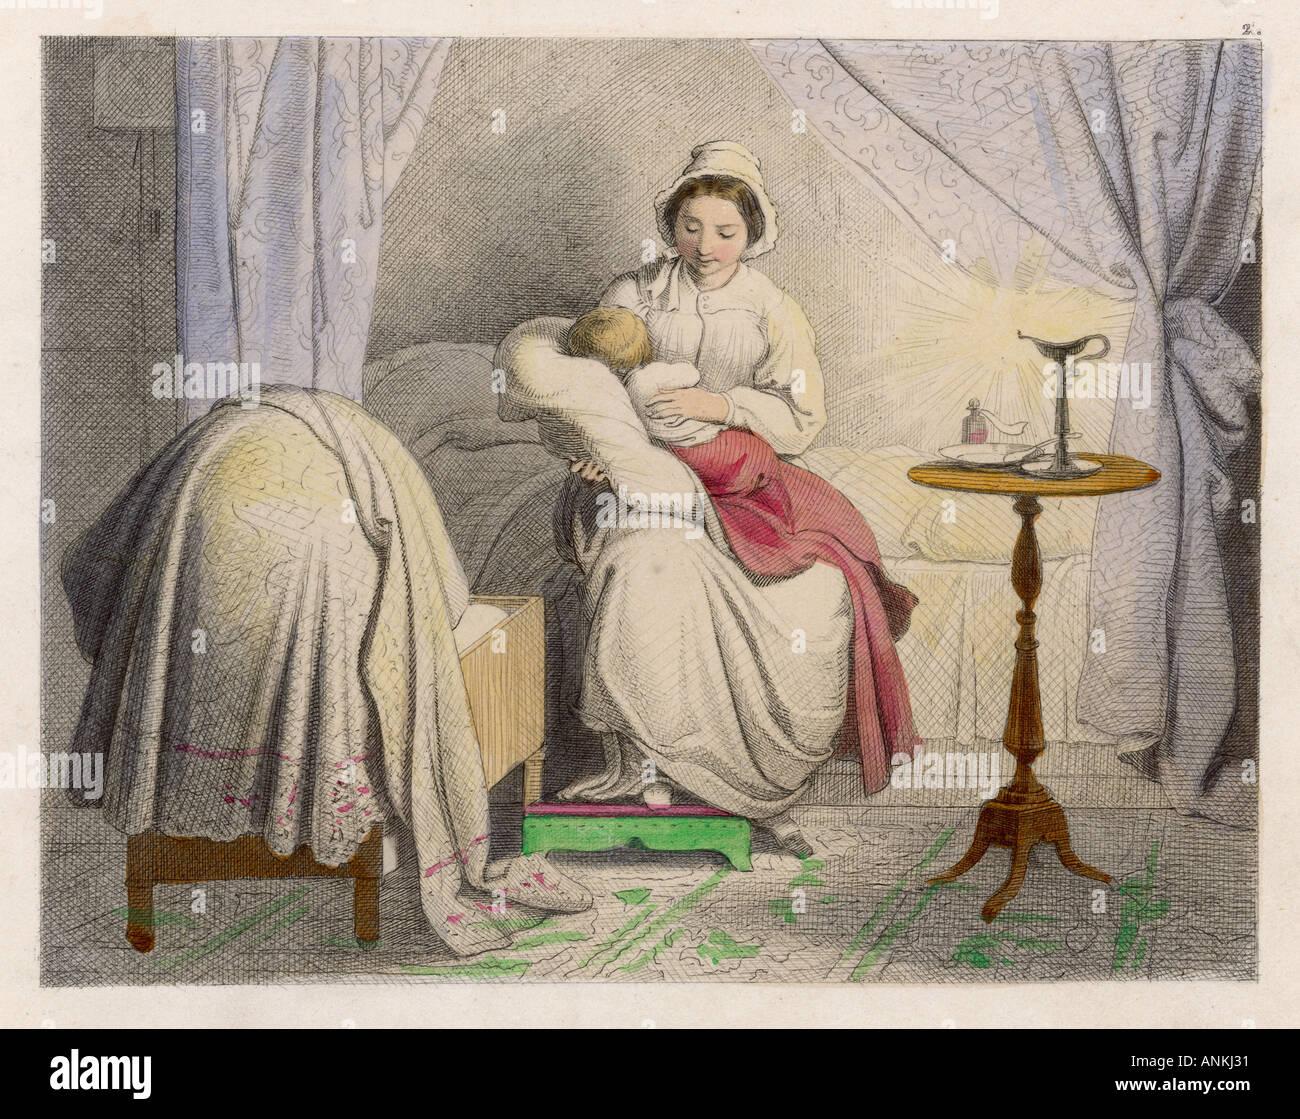 Sleeping On Mothers Lap - Stock Image